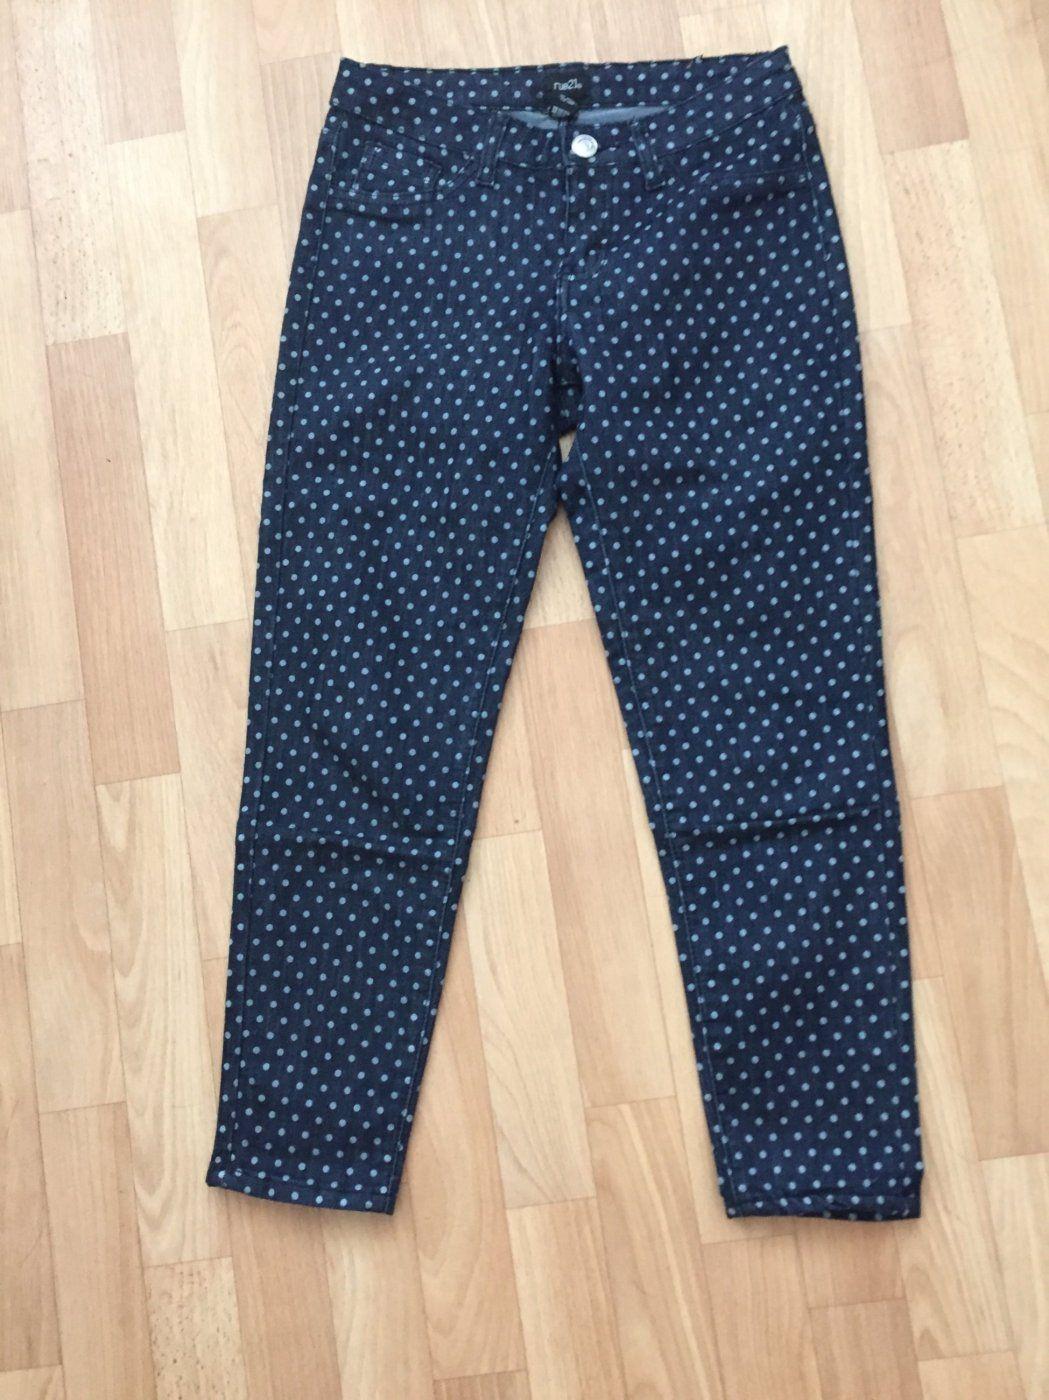 mfcdn.de product 1400x1400 rue-21-ankle-jeans-gepunktet-3ecbd8.jpeg